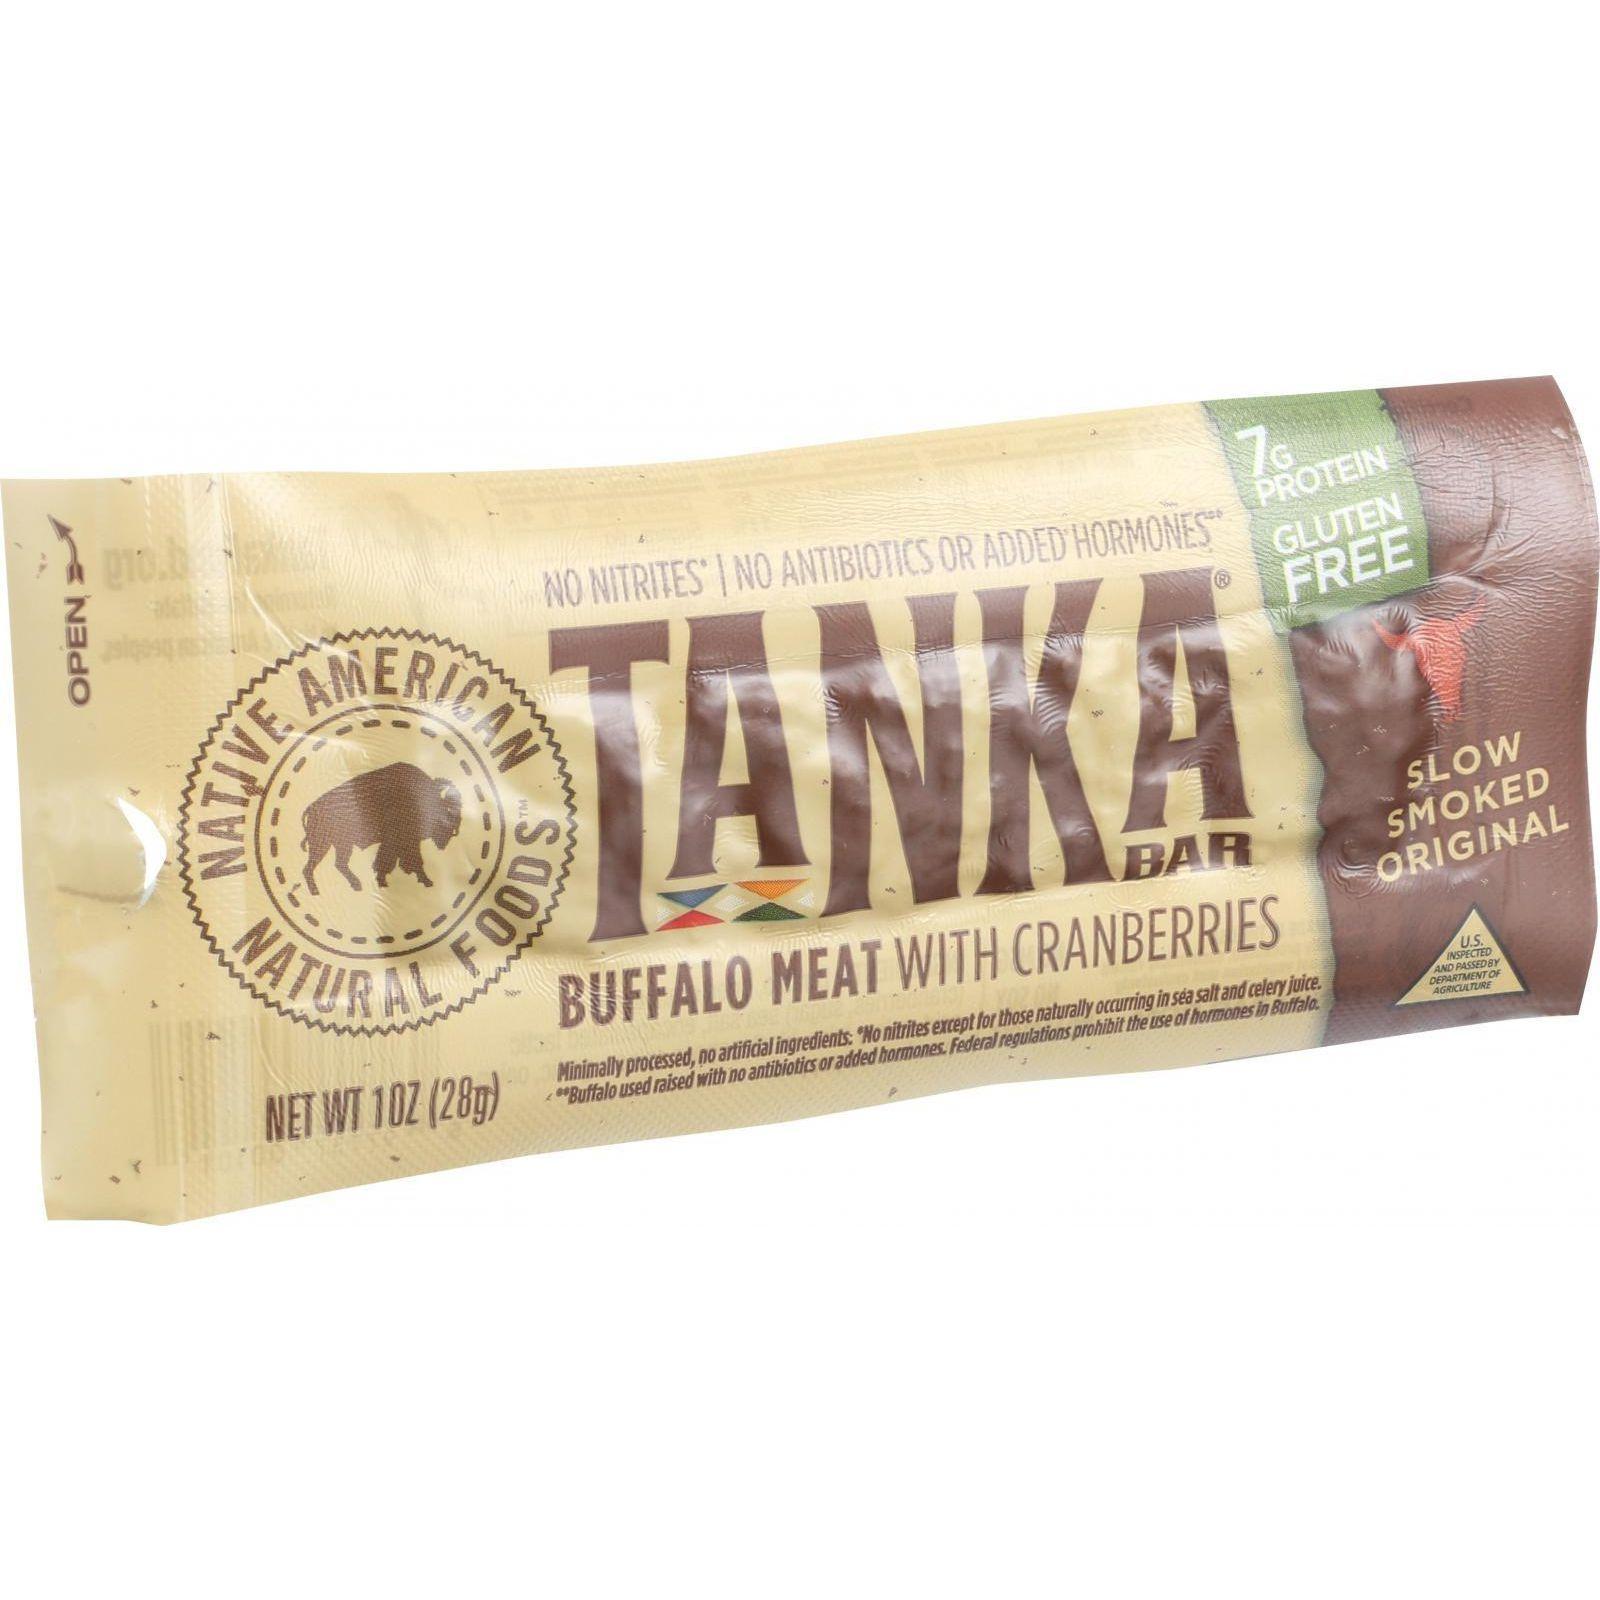 Tanka Bar - Buffalo with Cranberry - 1 oz - Case of 12